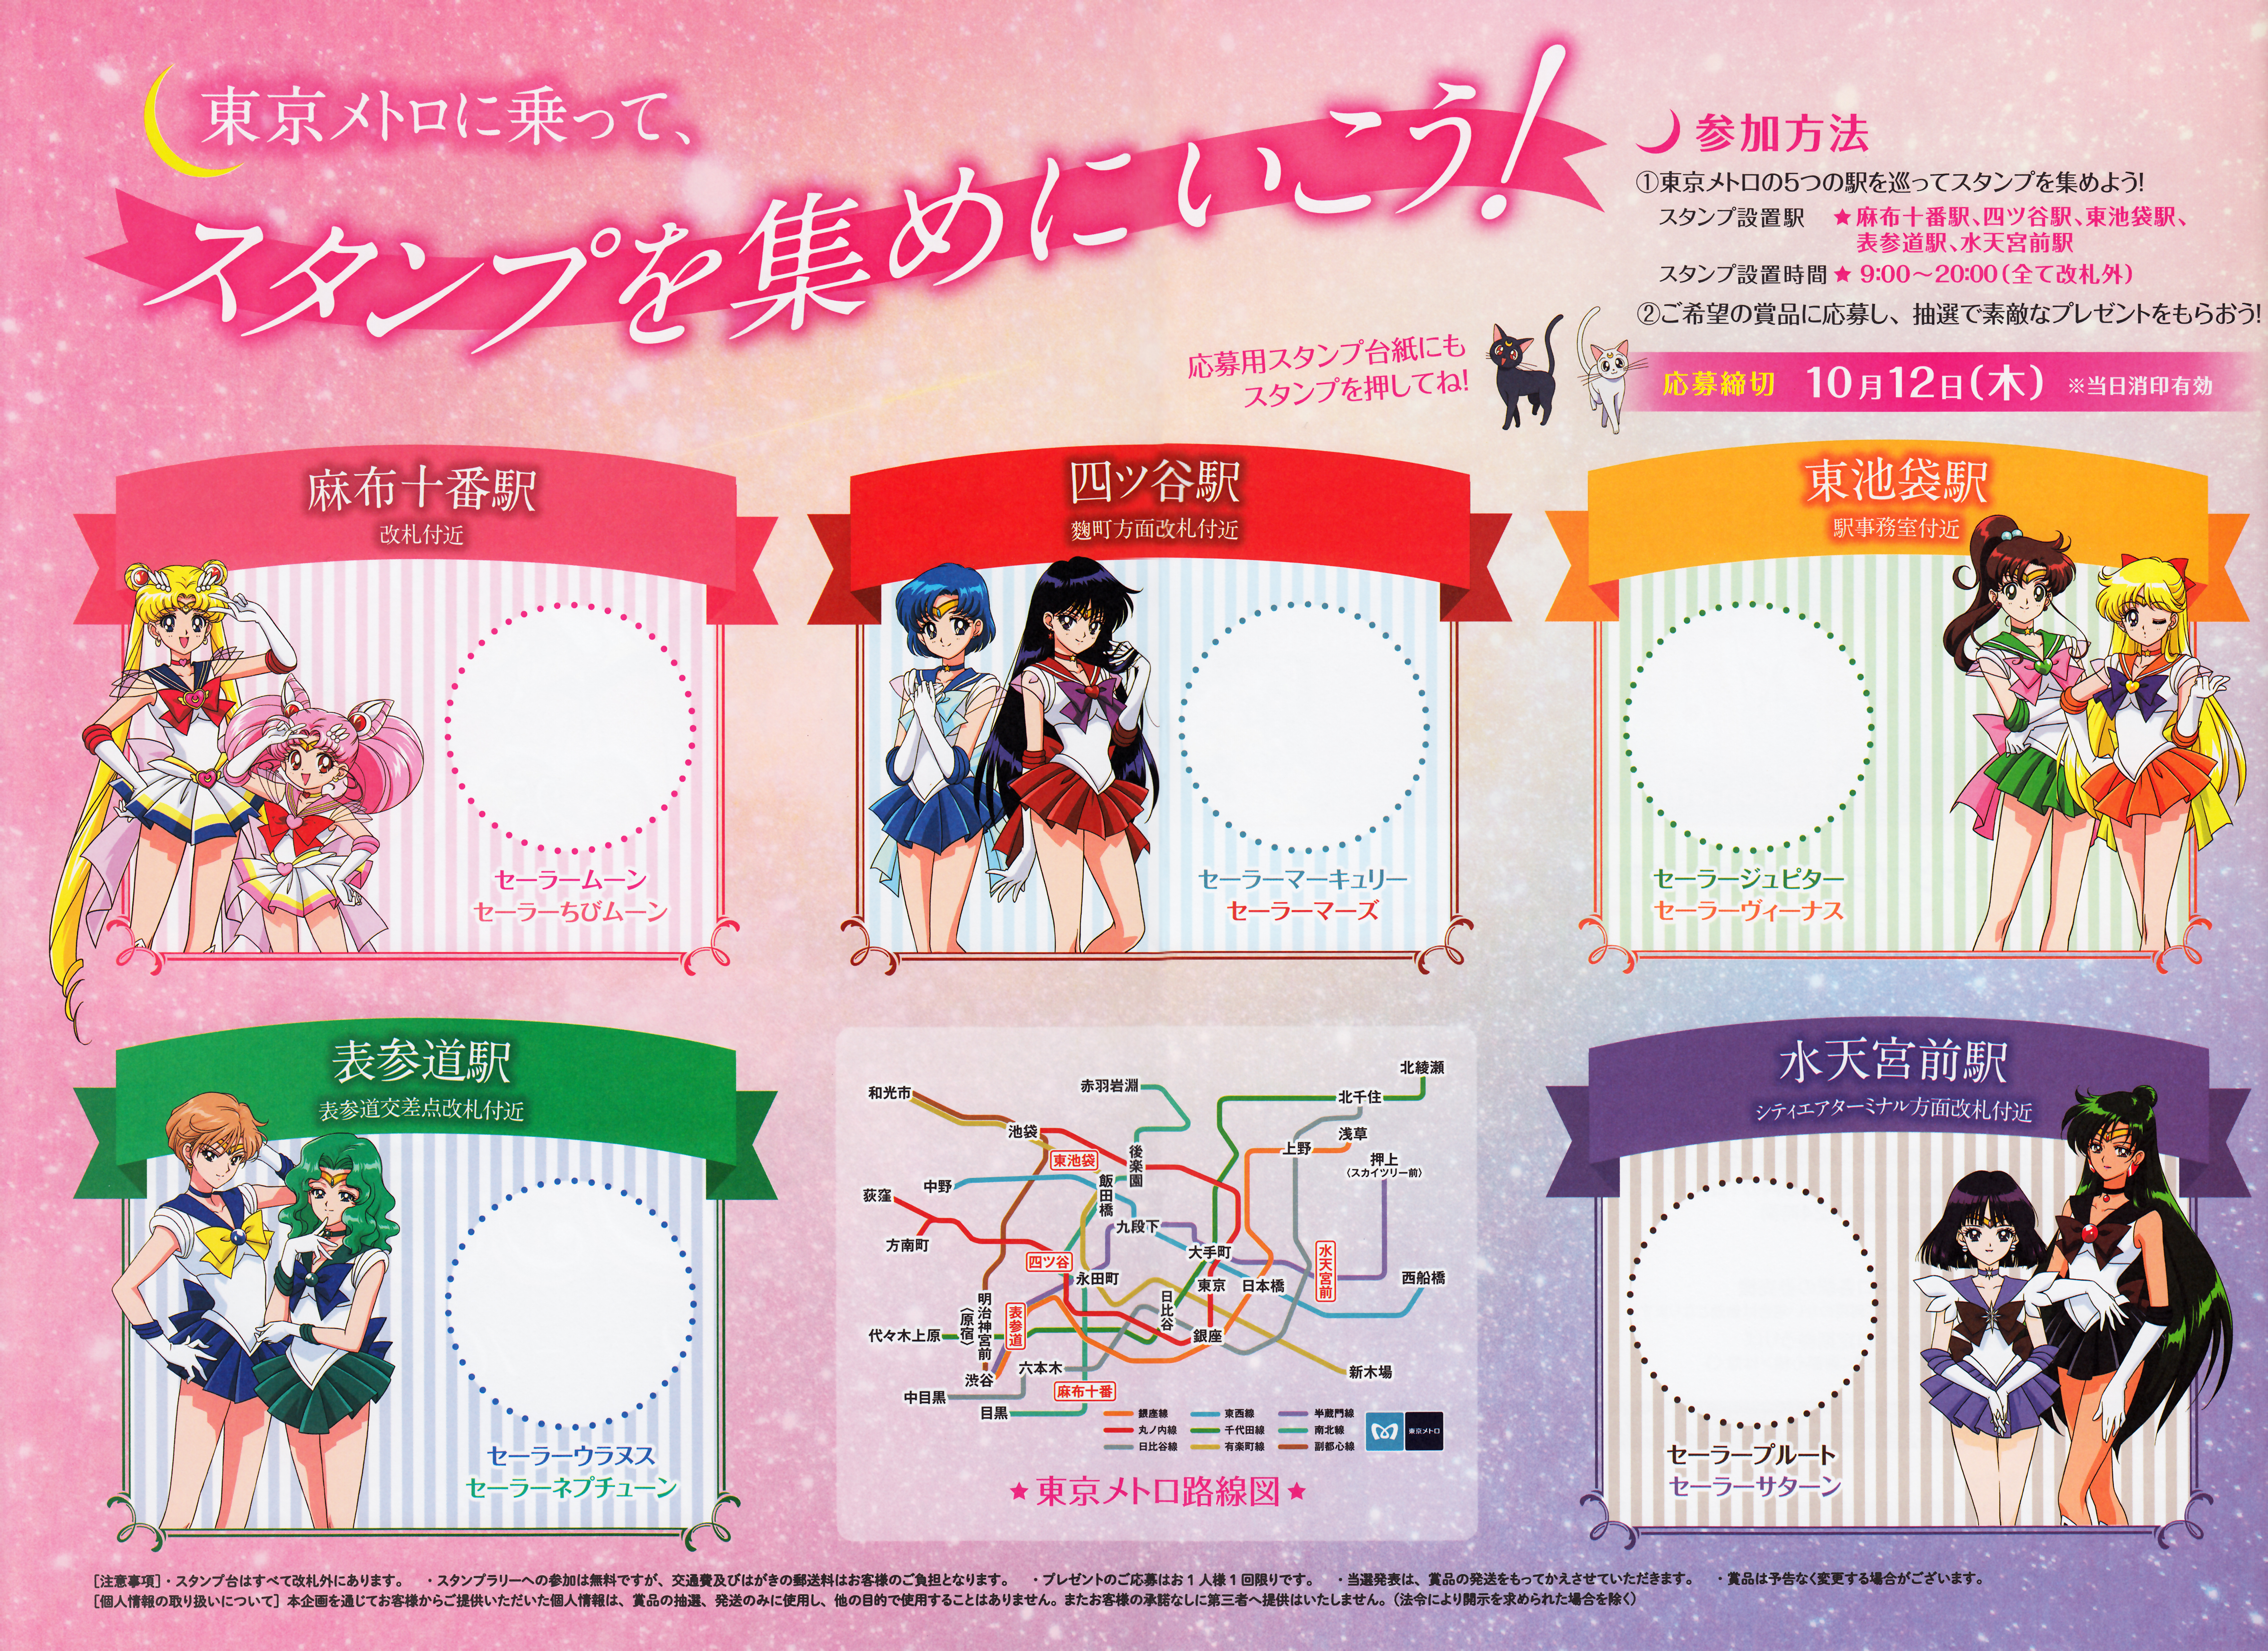 Sailor-moon-tokyo-metro-pamphlet-05